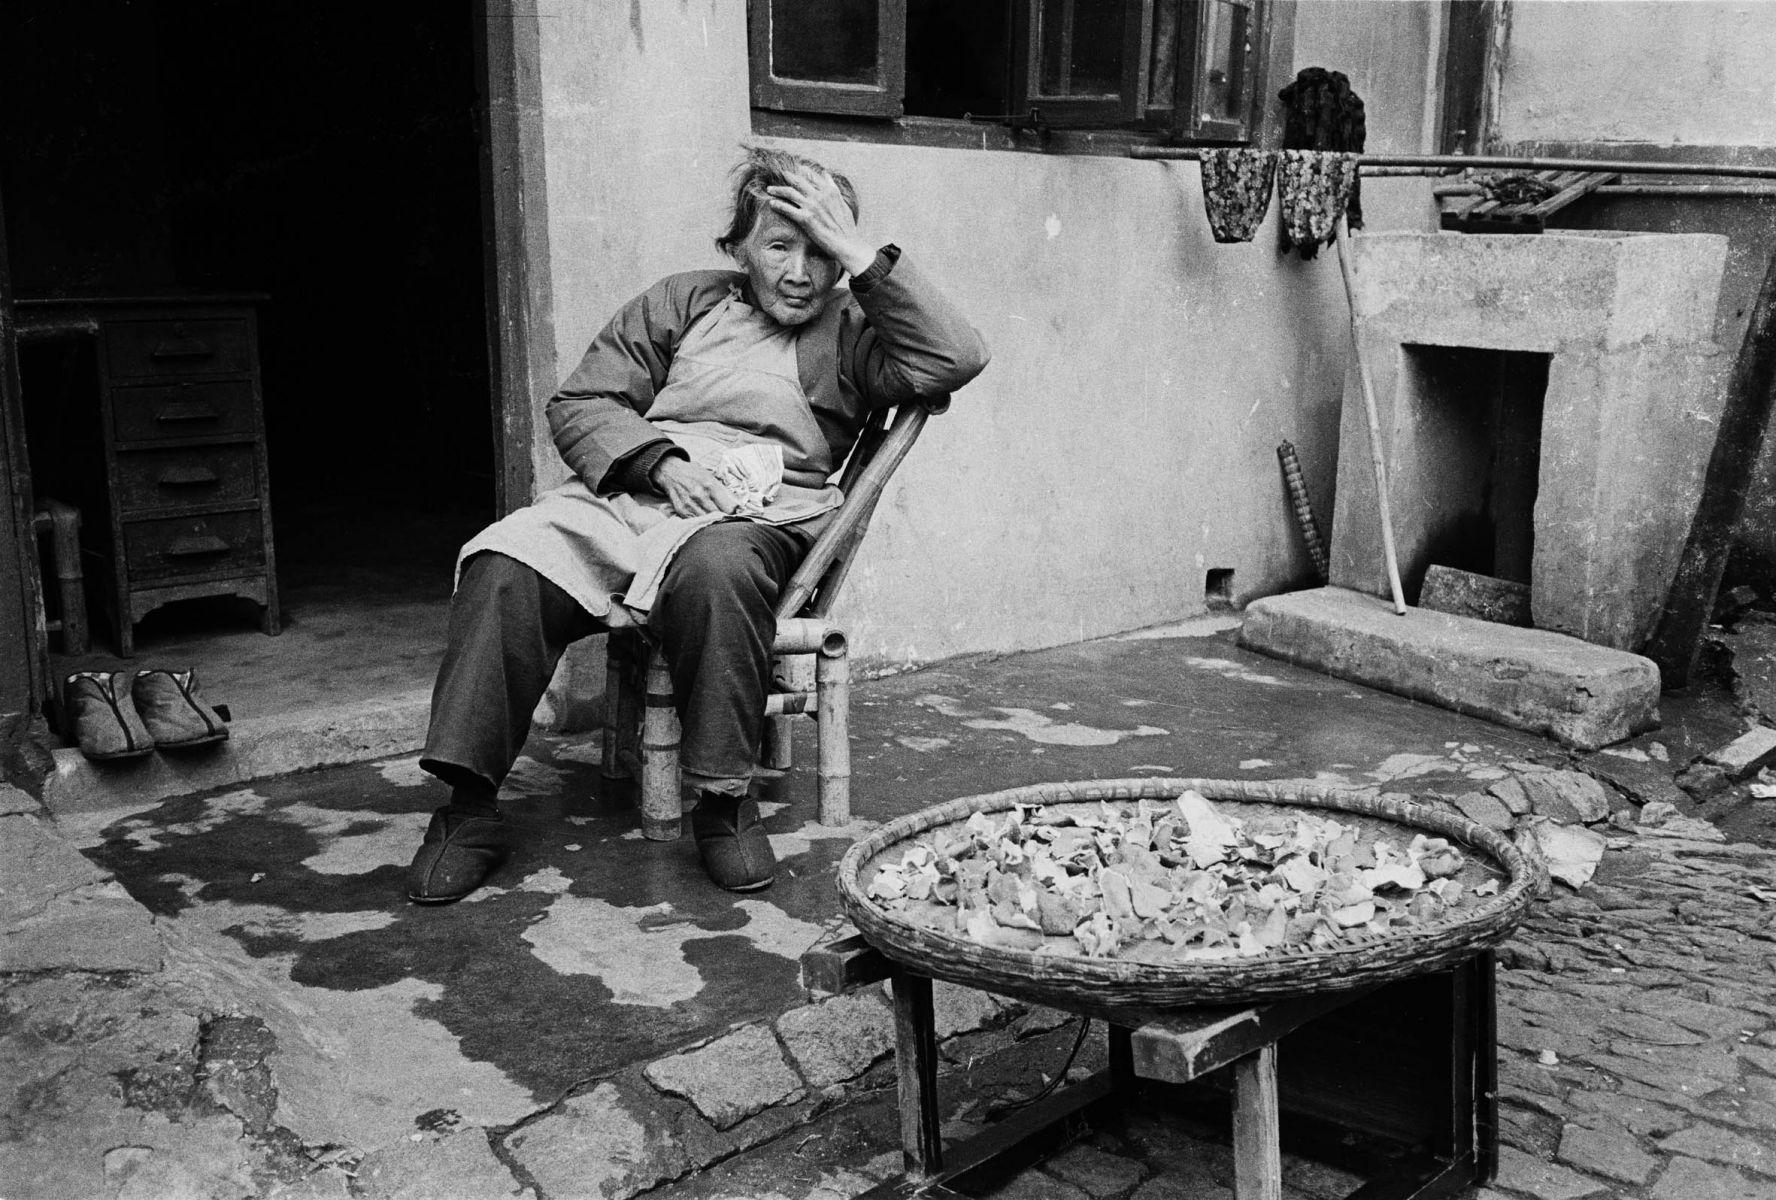 1shanghai_1985_film_20_pa_copy